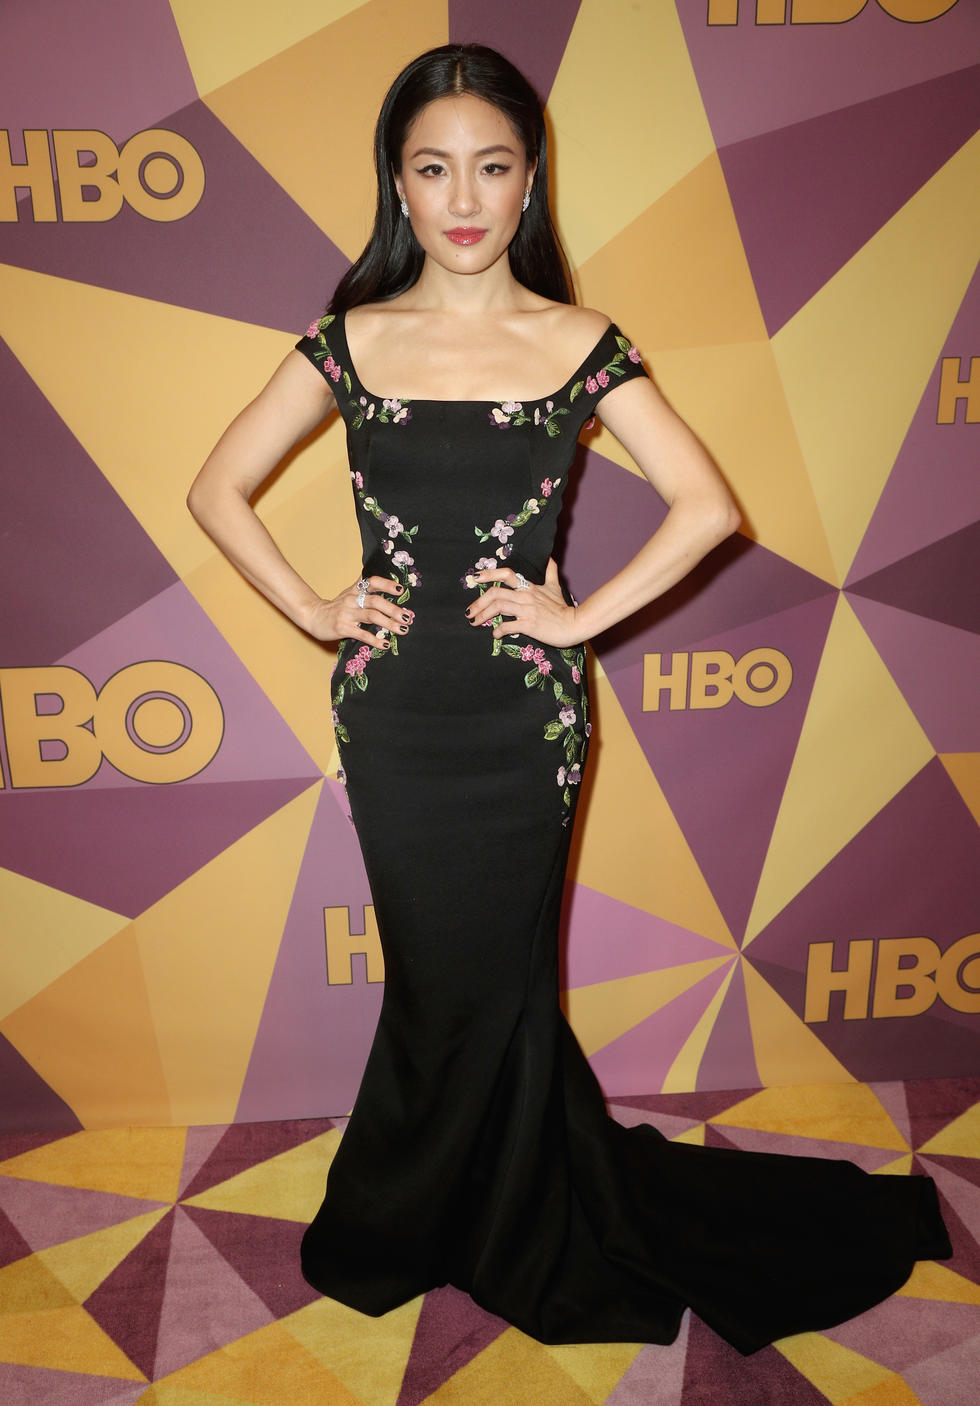 'Fresh Off The Boat' star Constance Wu in Zac Posen